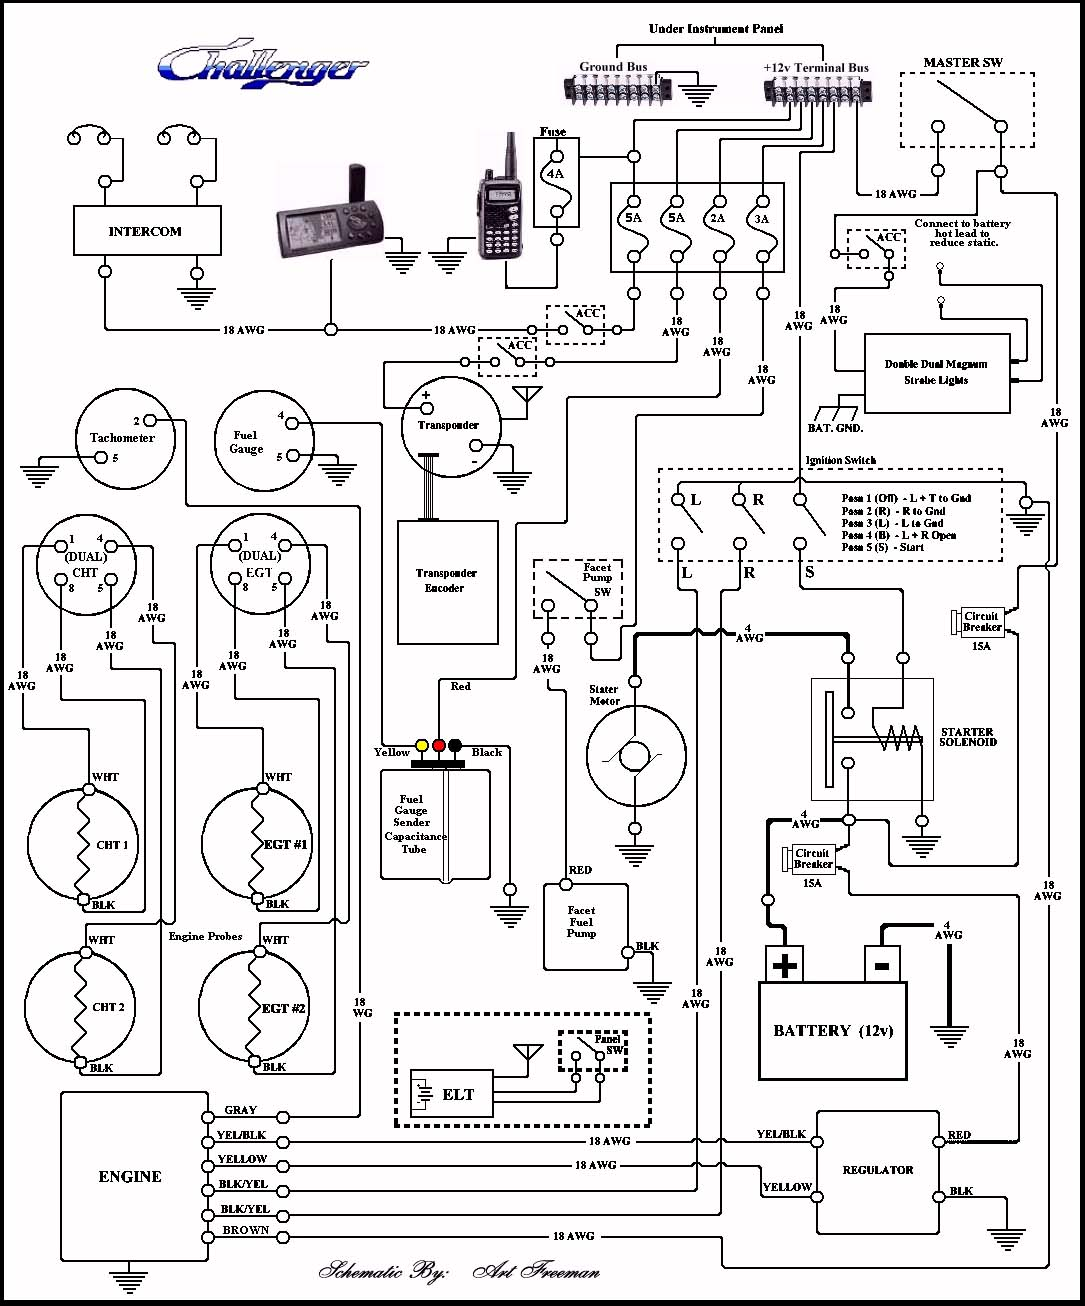 Schem_Analog?resize=665%2C800 king kma 24 wiring diagram kma funny, kma insurance card, kma kma 24 wiring diagram at pacquiaovsvargaslive.co